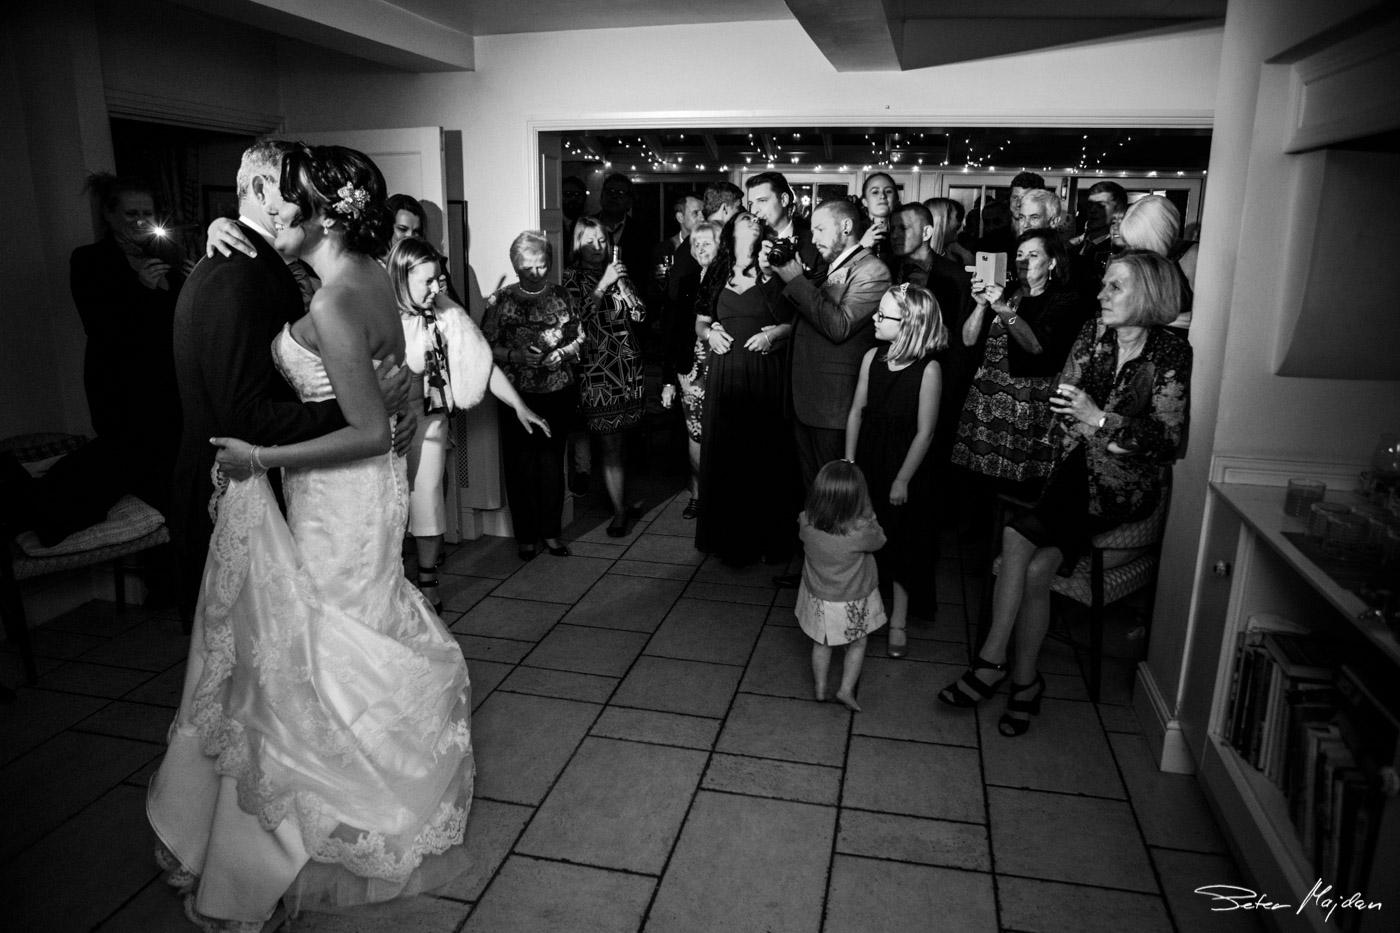 east-bridgford-hill-wedding-photography-65.jpg